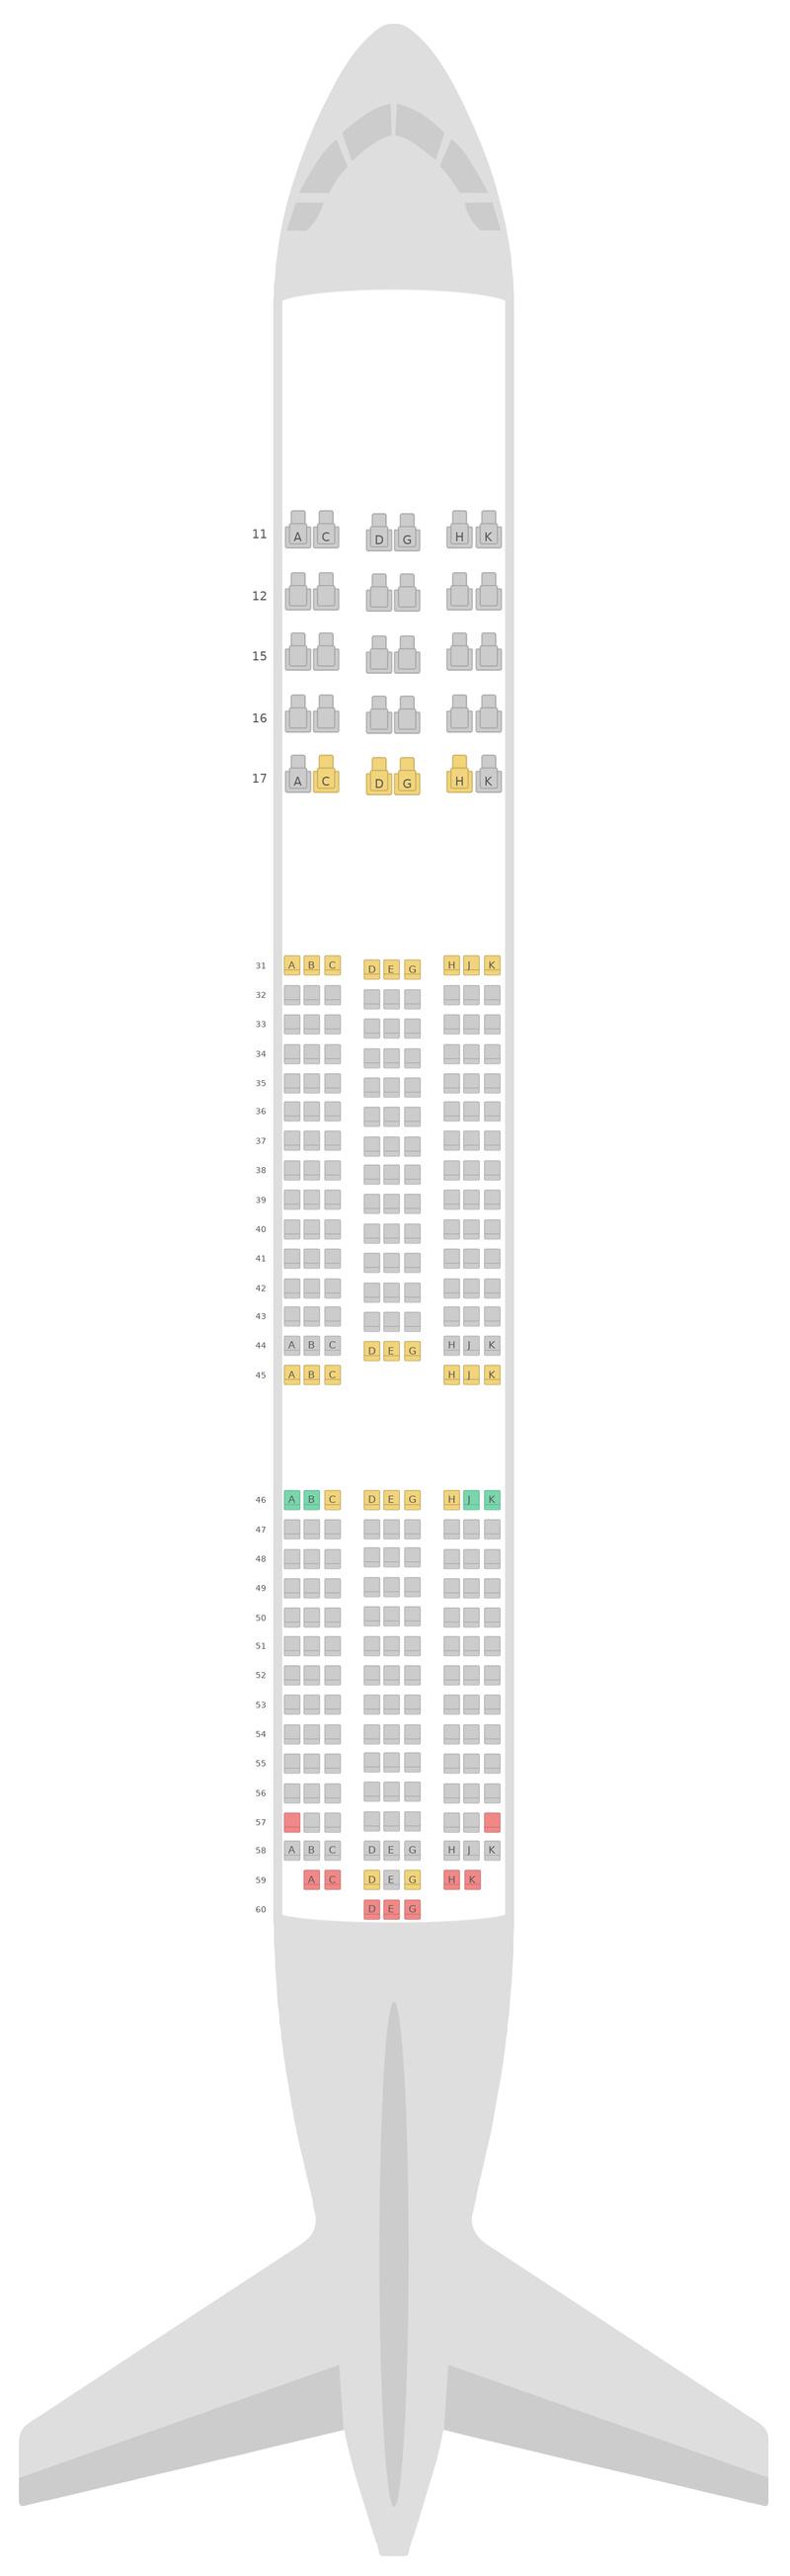 Sitzplan Boeing 787-9 (789) v1 Hainan Airlines